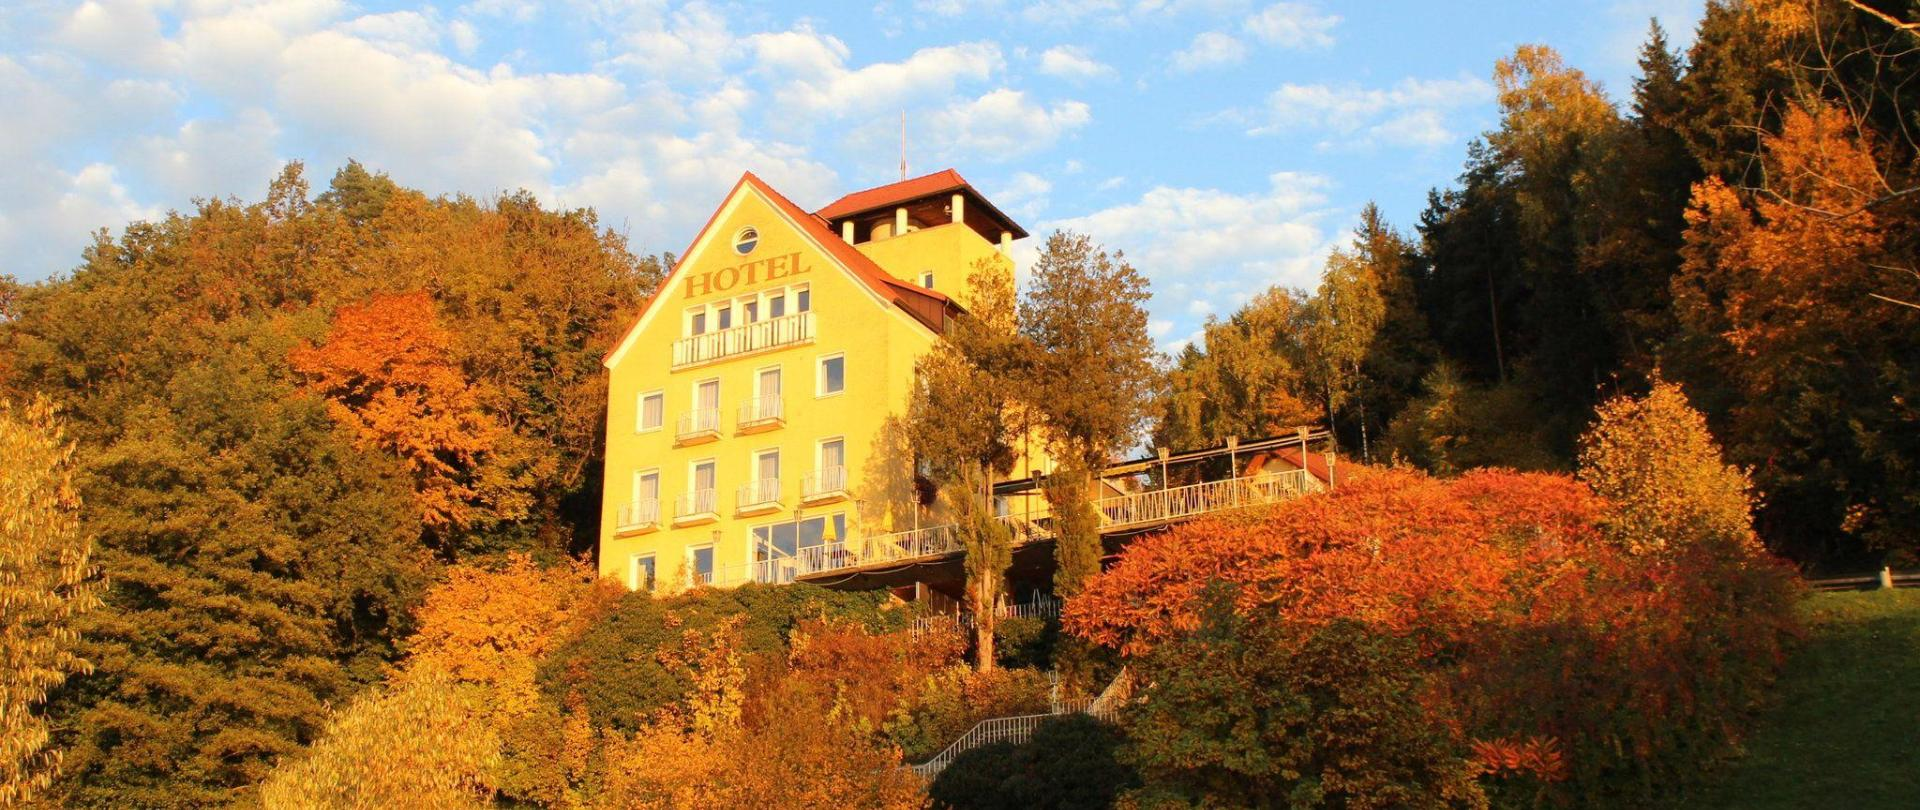 hotelbild1.jpg